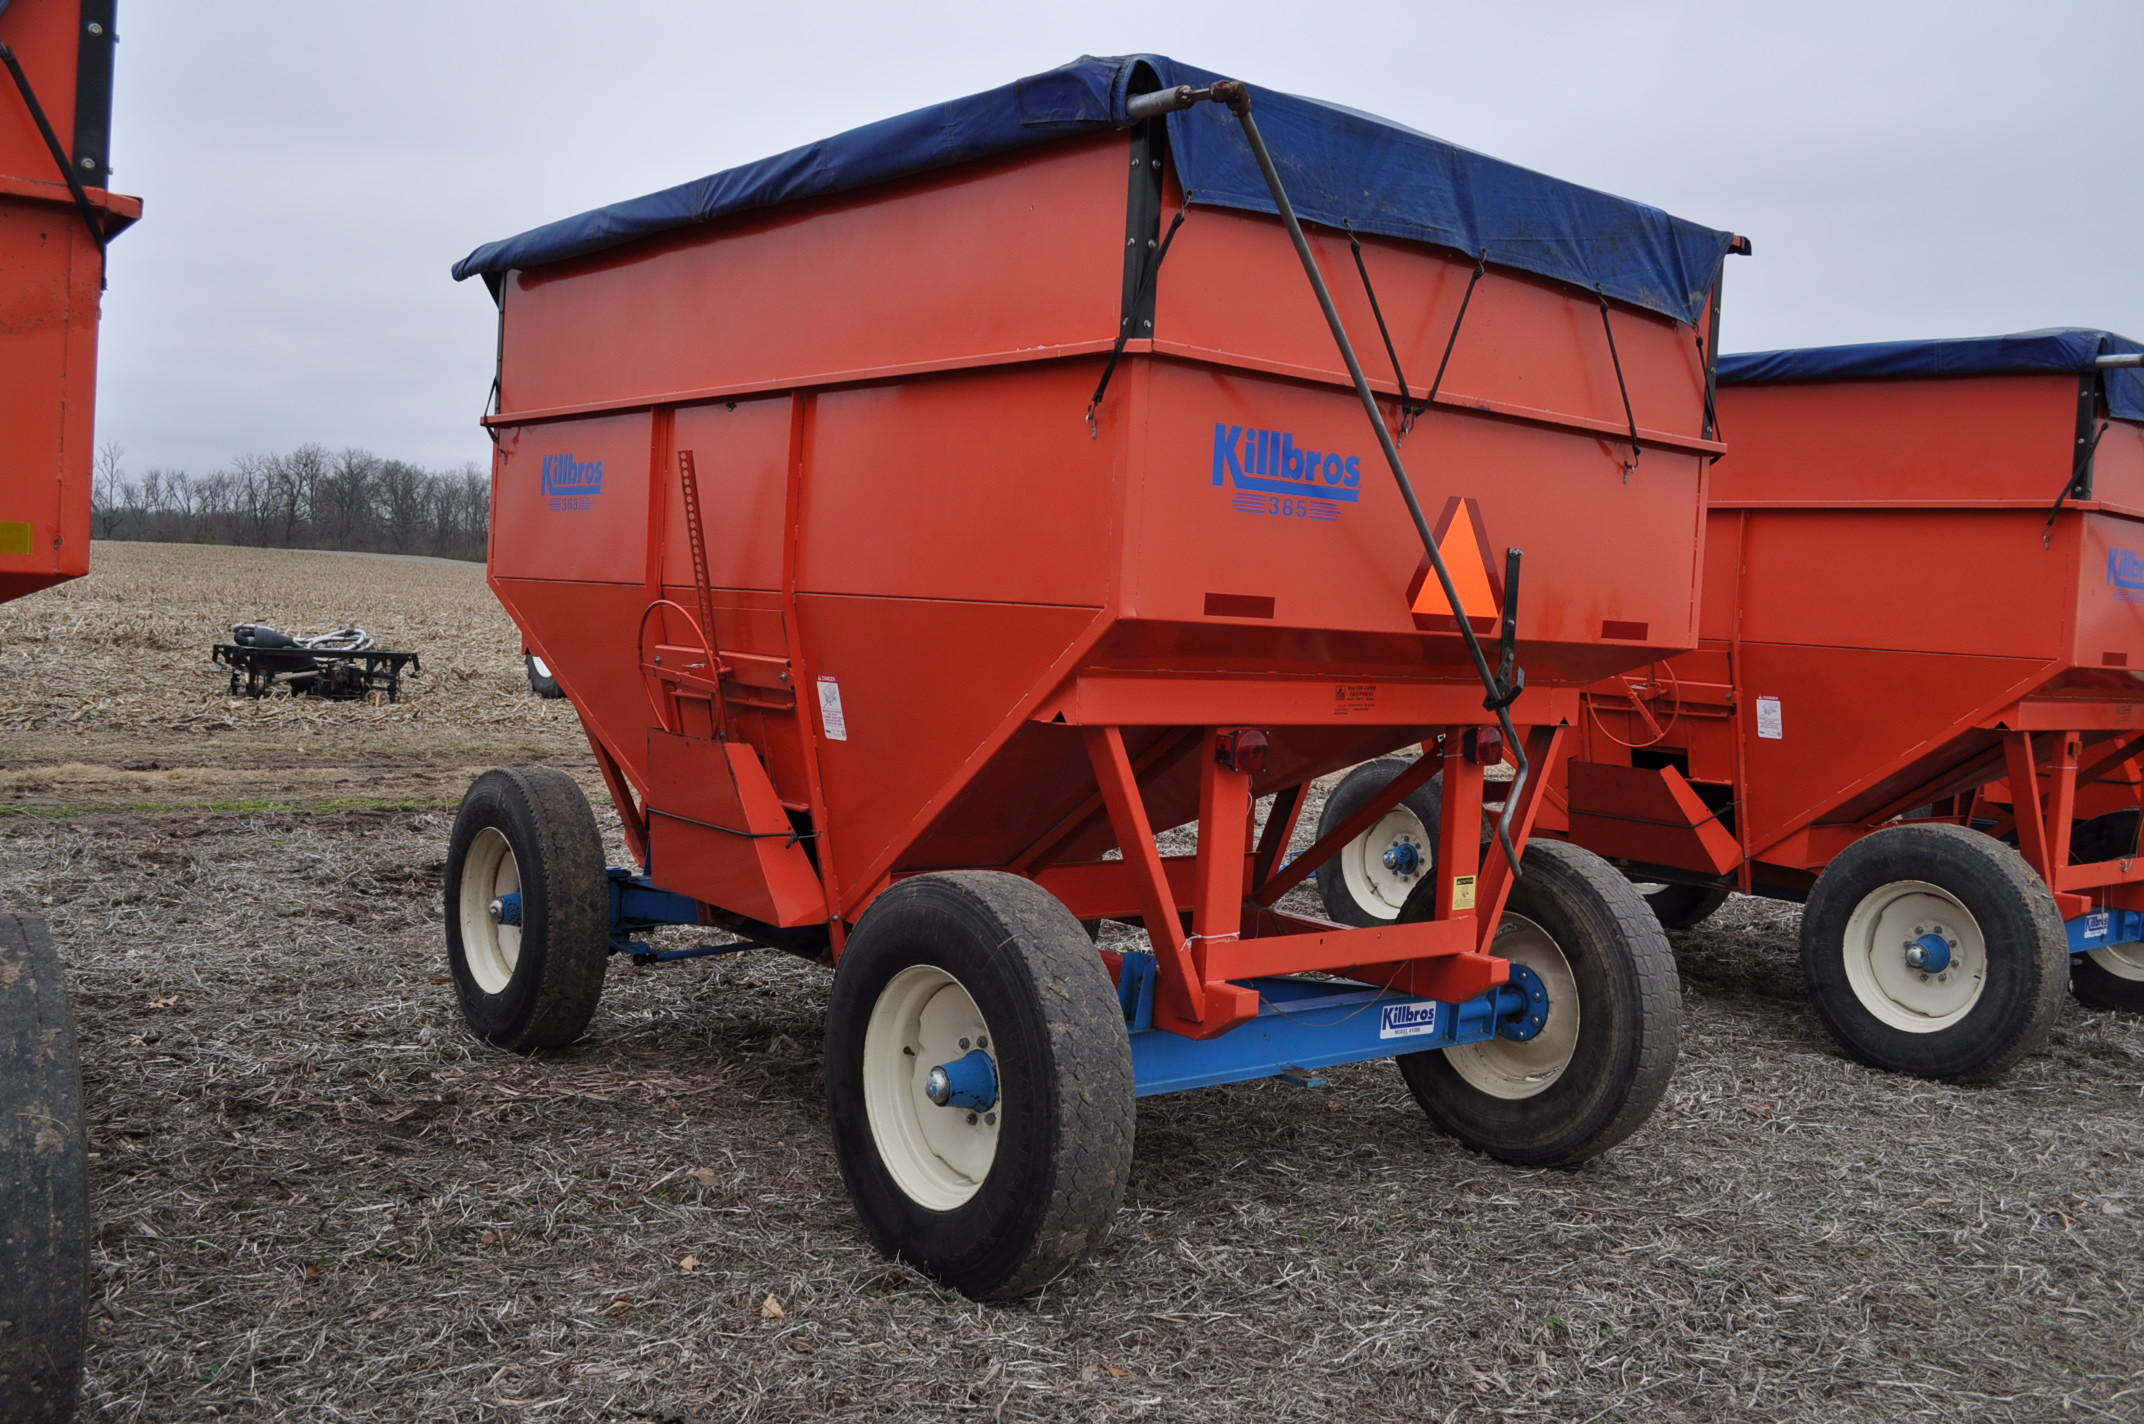 Killbros 385 gravity bed wagon, tarp, steel rails, Killbros 1386 gear, 11 R 22.5 tires - Image 2 of 7